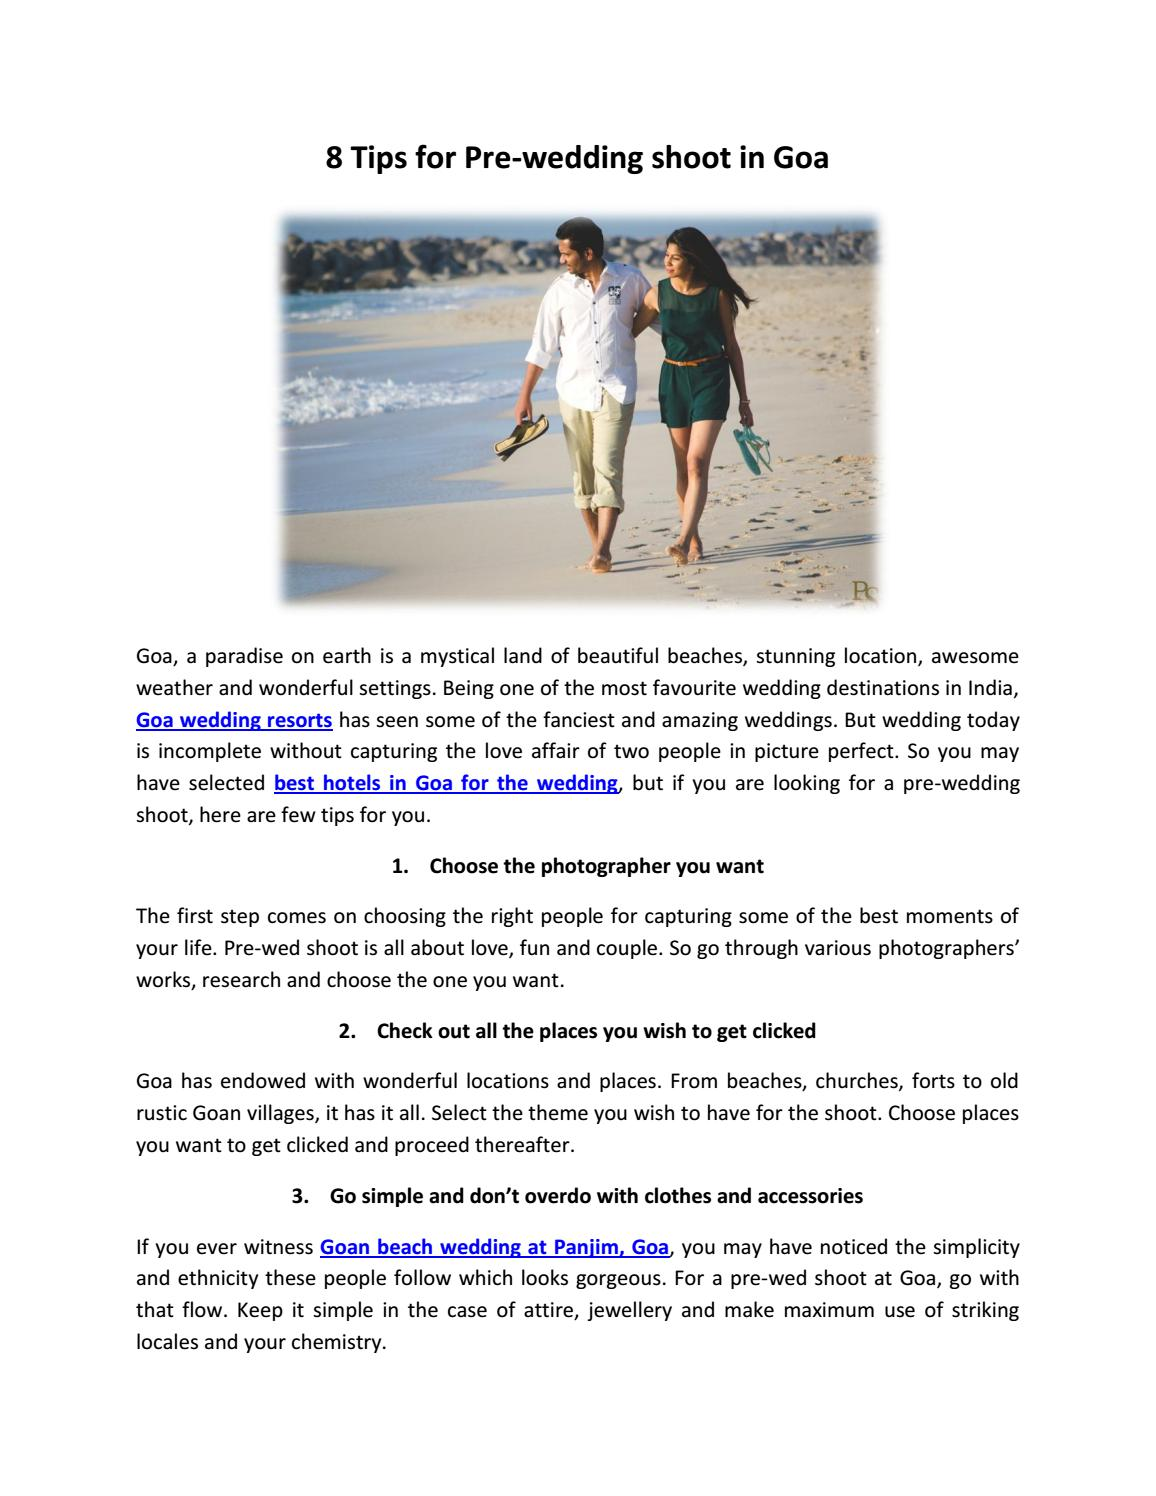 a341cbee2f7 8 Tips for Pre-wedding shoot in Goa by ShubhamJindal - issuu